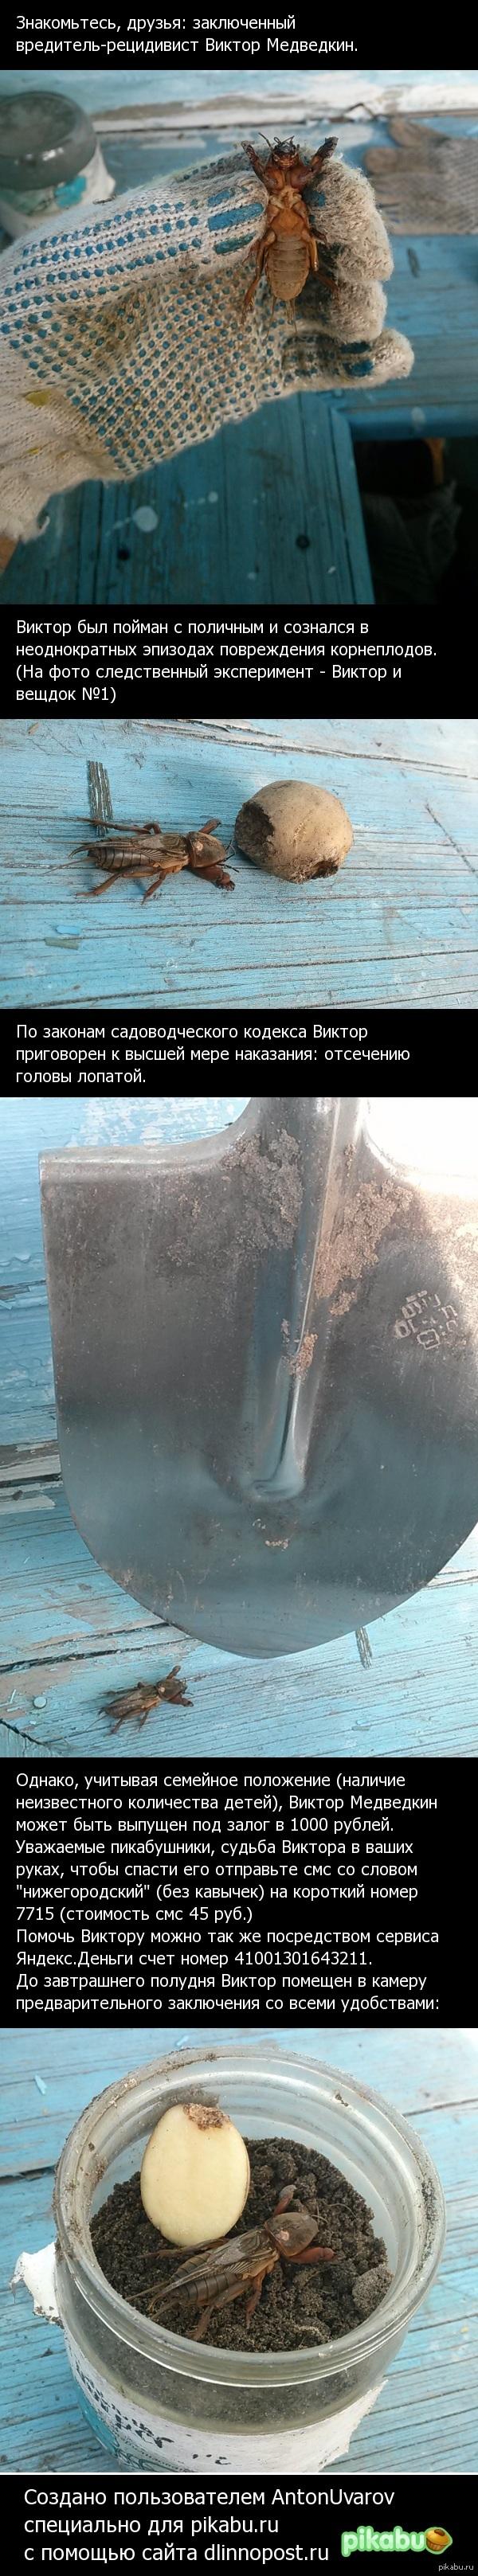 Спасти заключенного Виктора Медведкина